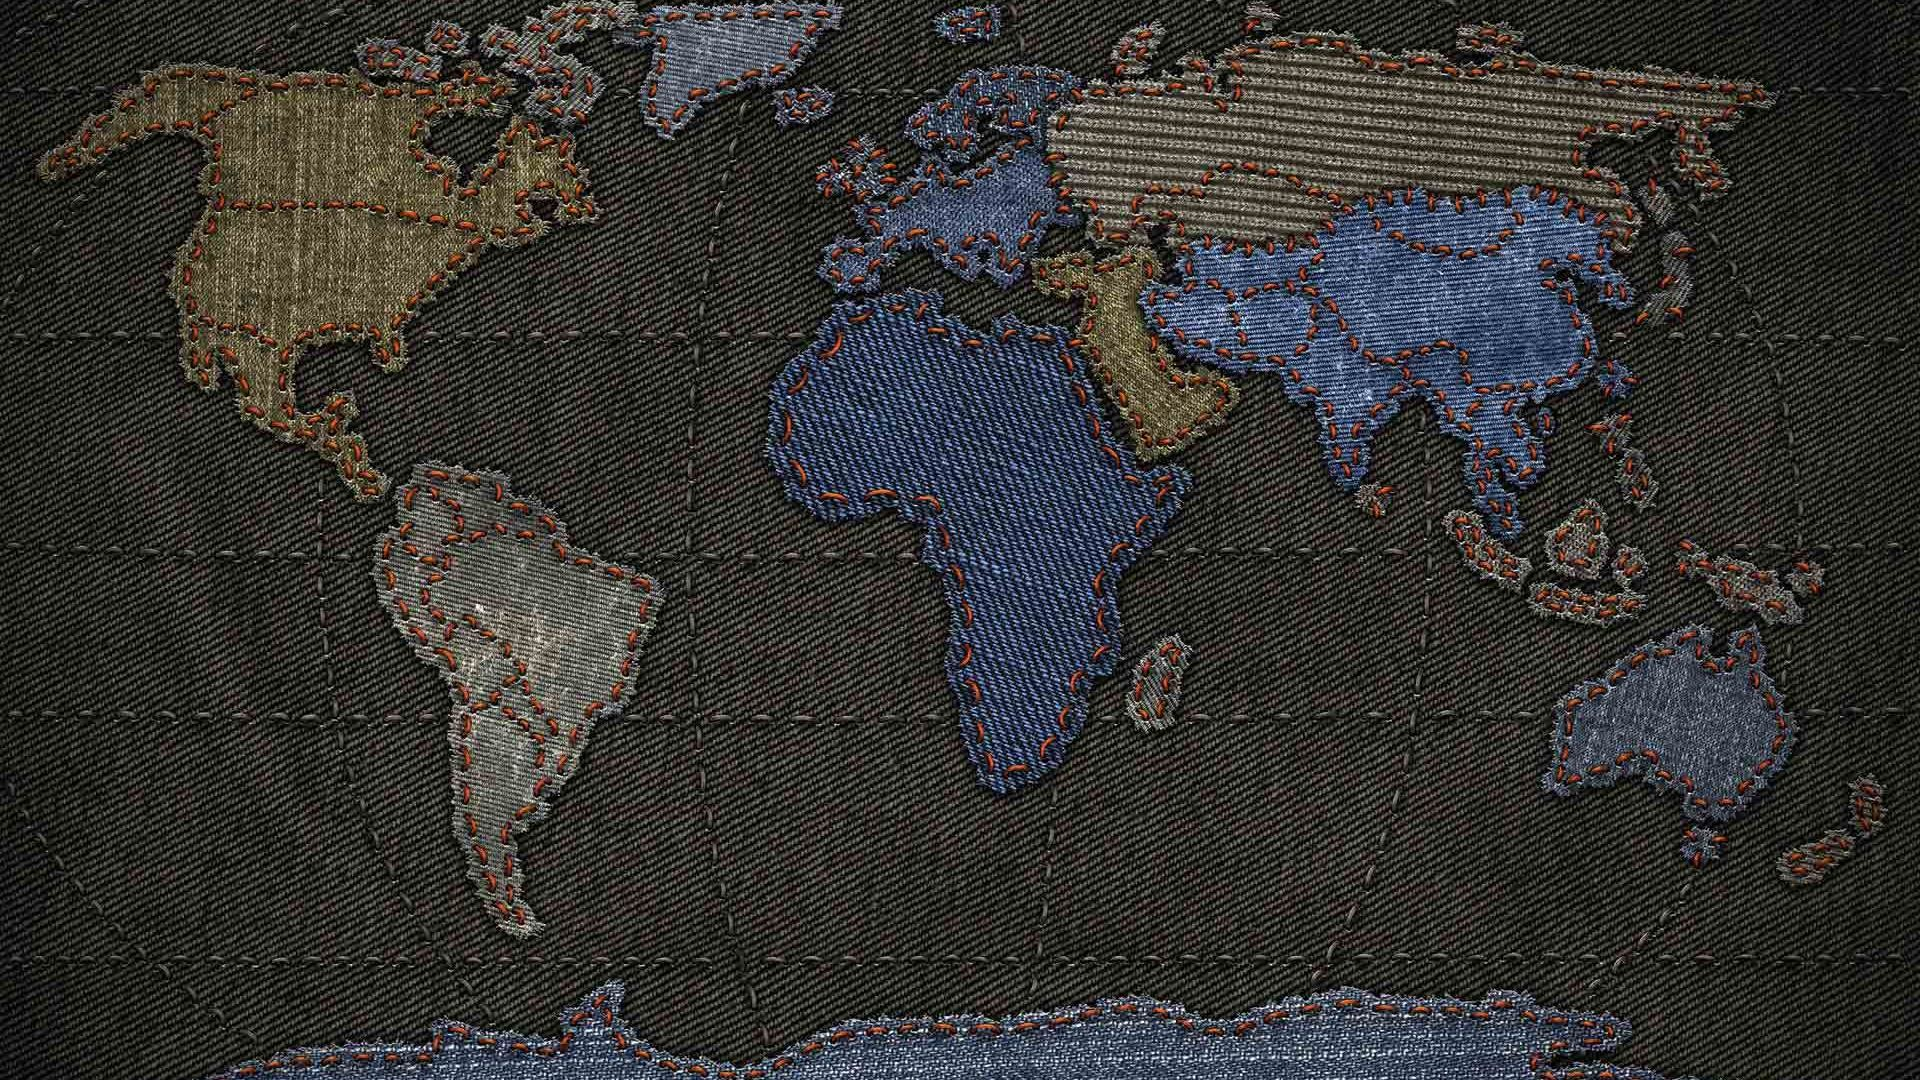 World map computer wallpaper 62 images 1920x1080 publicscrutiny Choice Image